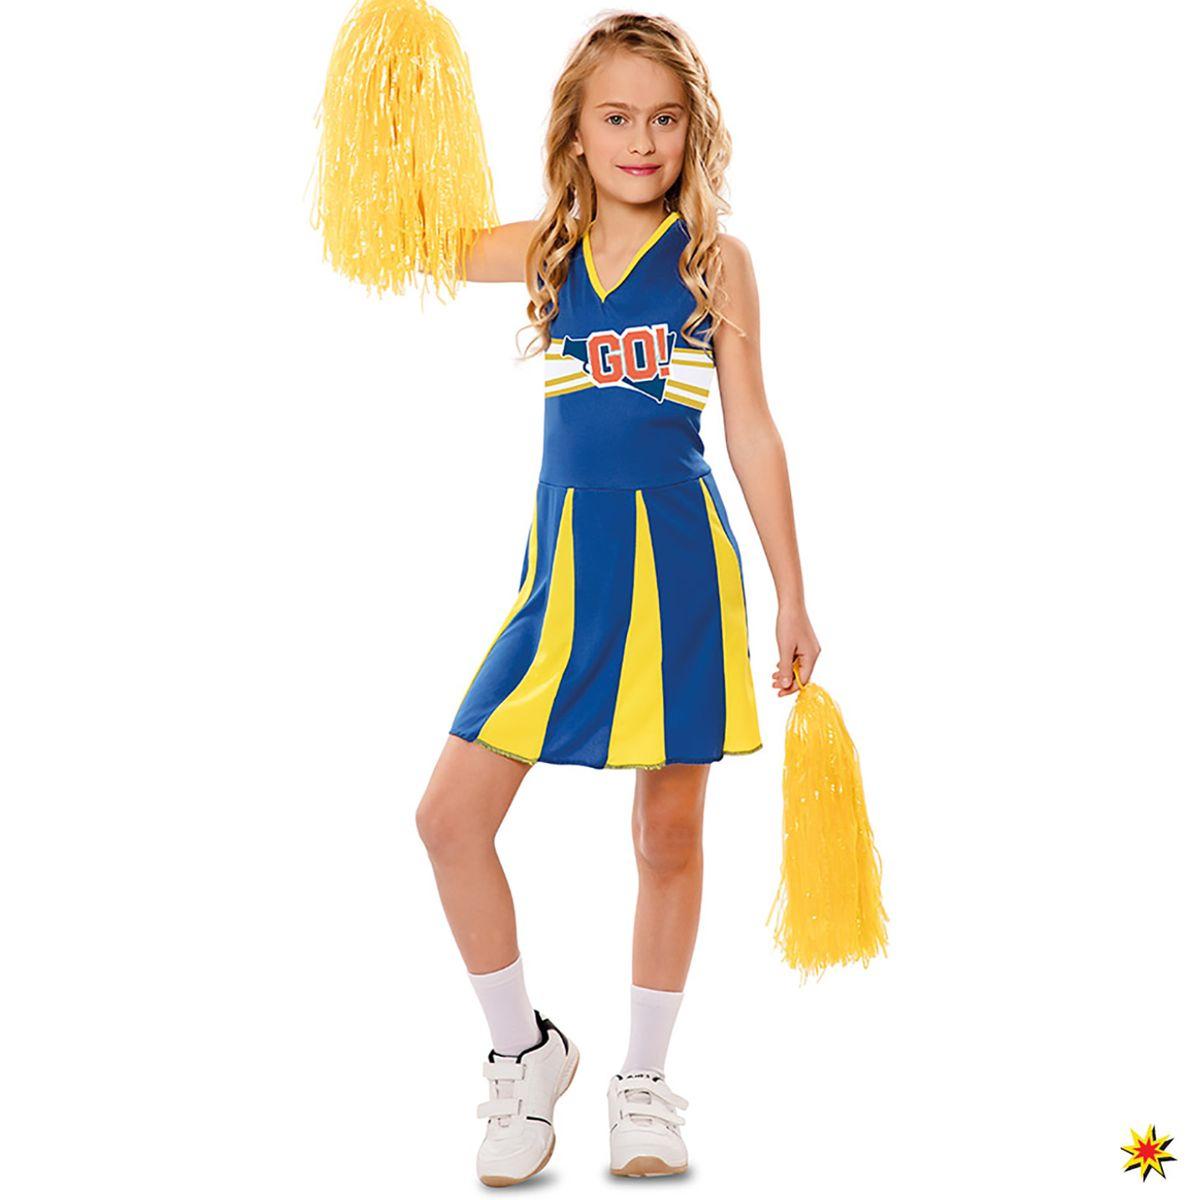 Kinder Kostum Cheerleaderin Blue Arrow Grosse M 5 6 Jahre